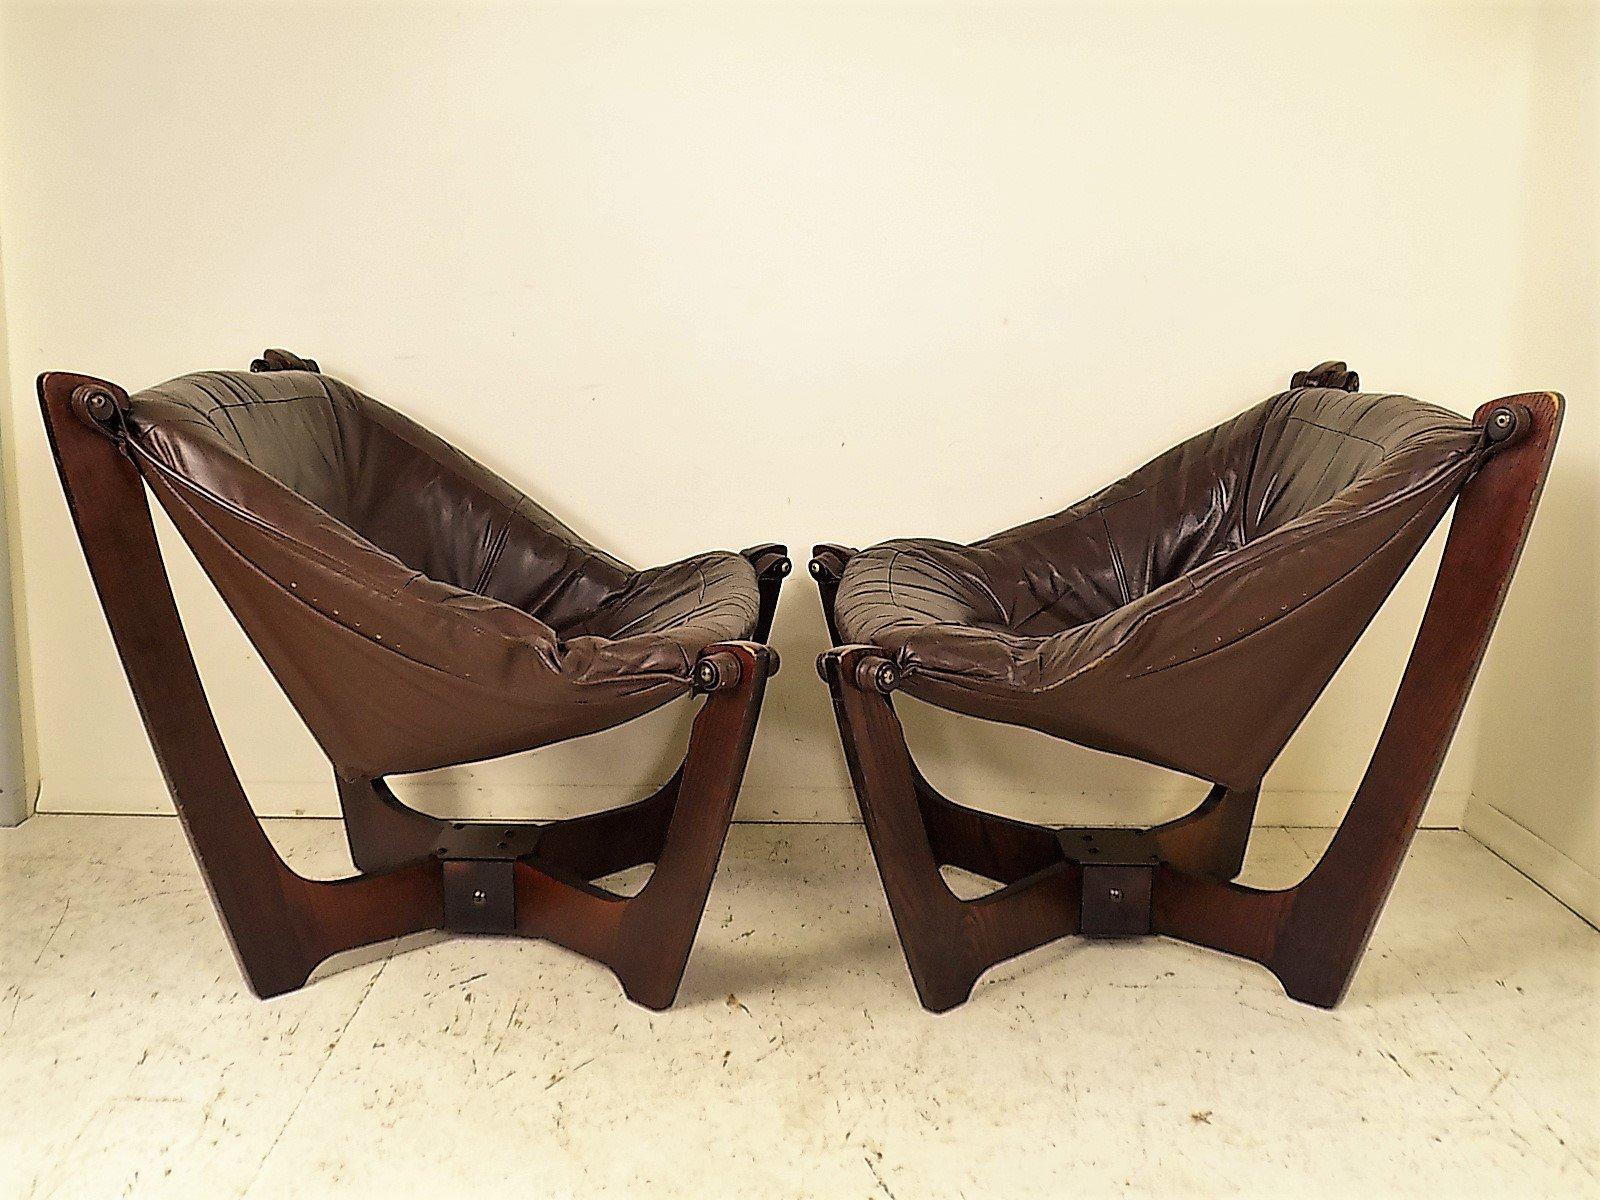 Odd Chairs Vintage Luna Lounge Chairsodd Knutsen For Hjellegjerde Set Of